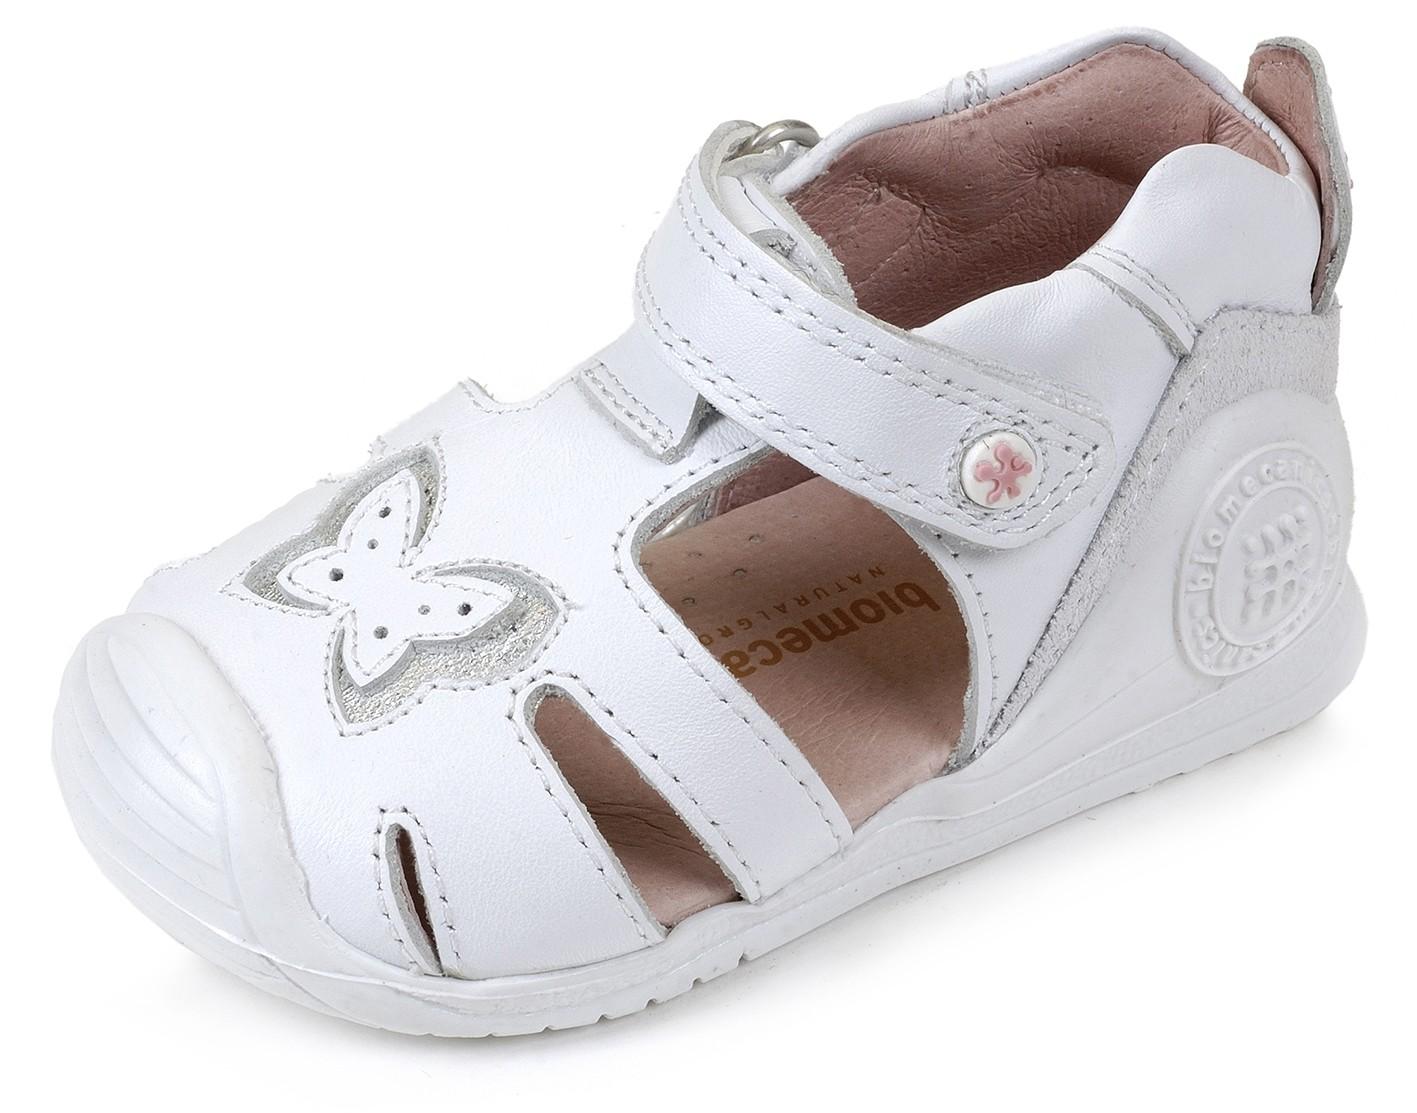 5372ad077 Sandalias Blanco NIña bebe 162131 Biomecanics